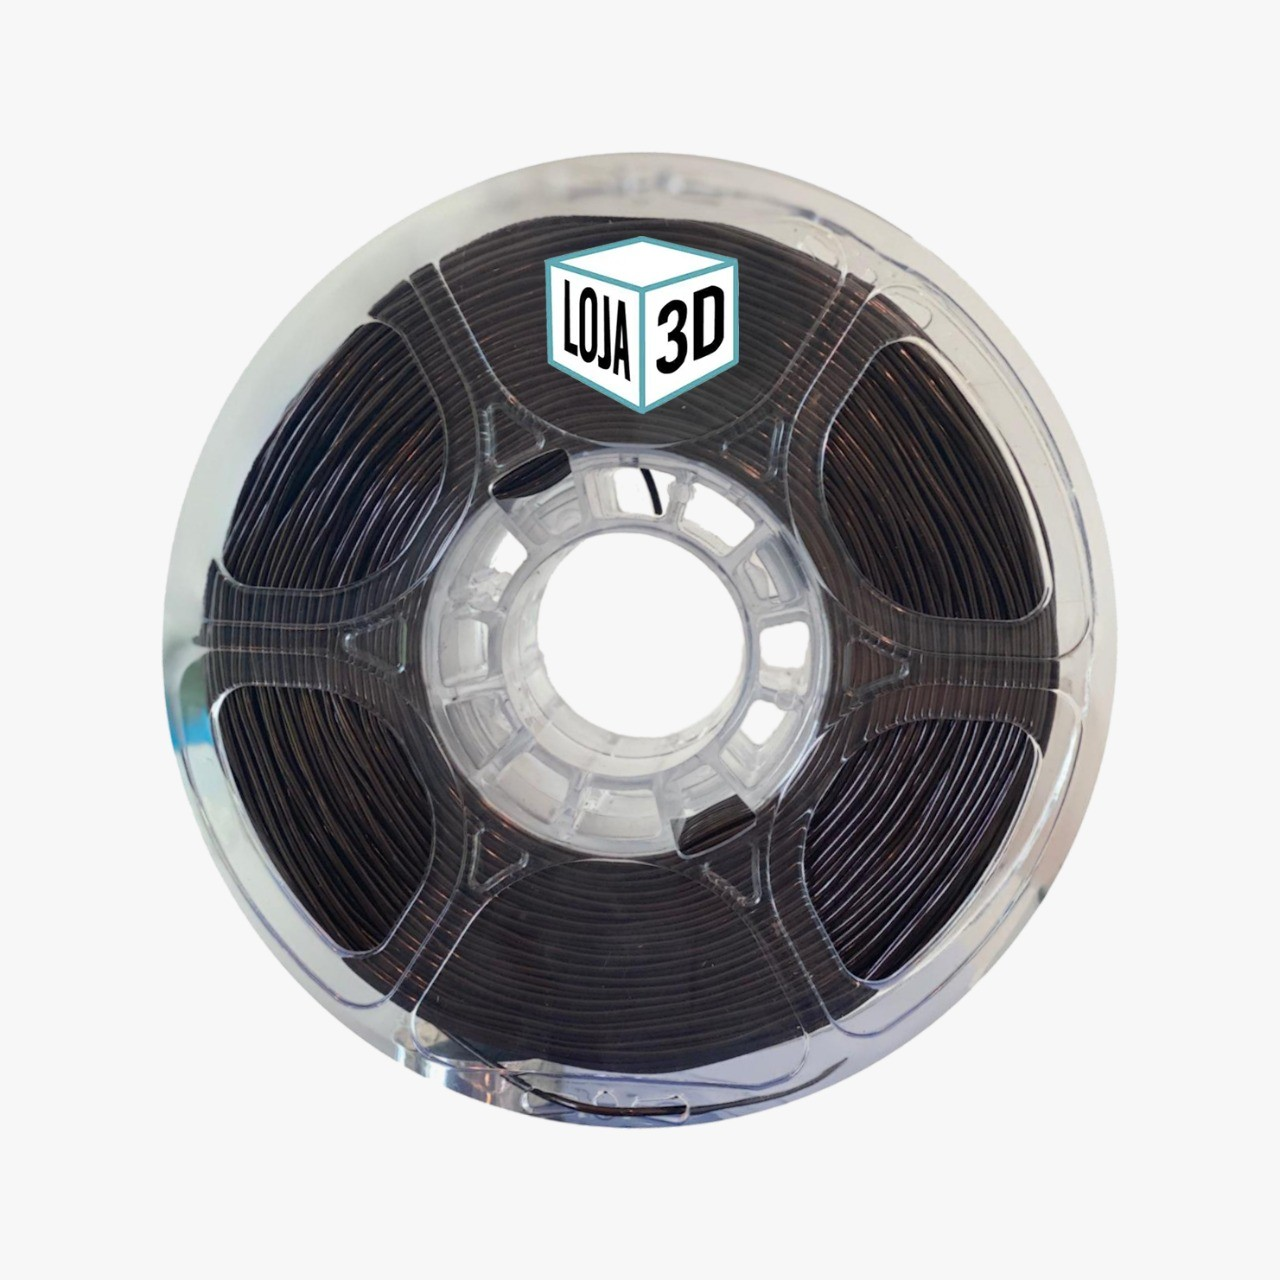 Filamento Flex TPU Premium - Marrom Escuro - Loja 3D - 1.75mm - 1kg